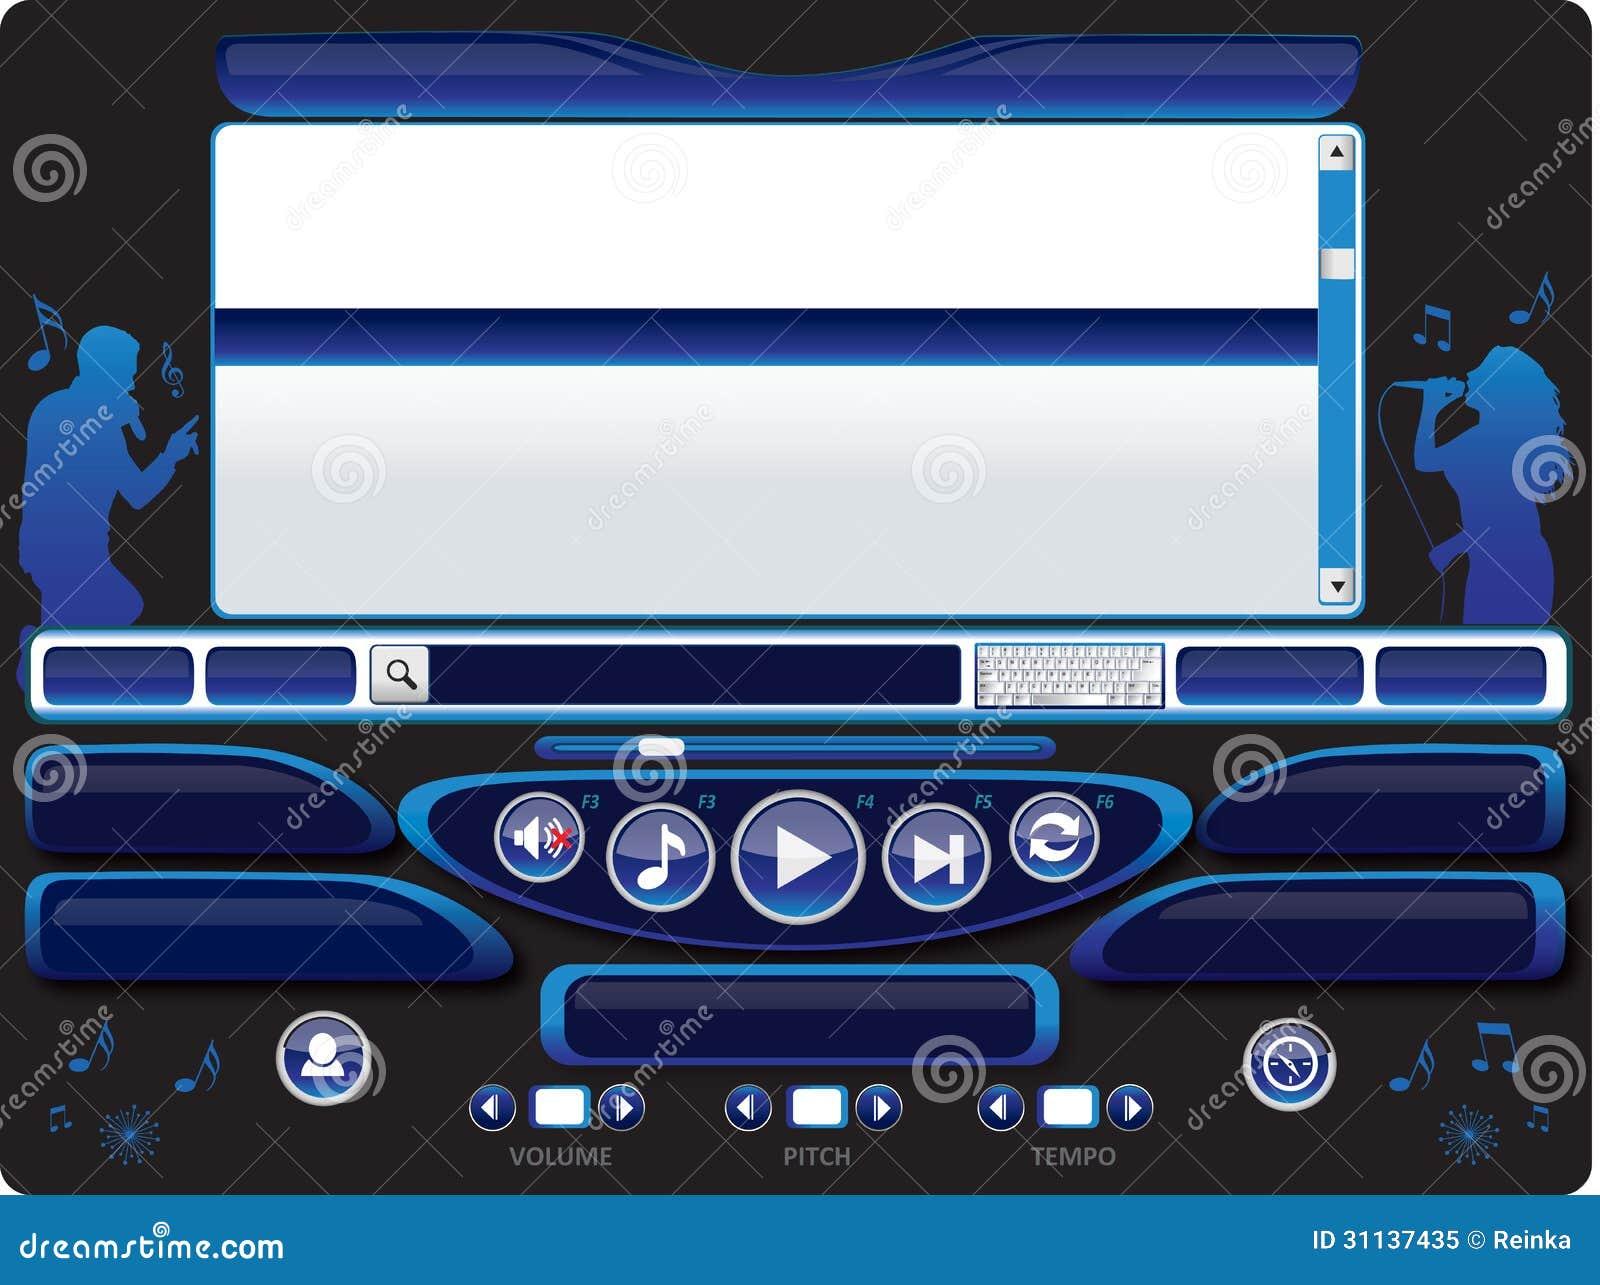 Basi-karaoke.com - Basi Musicali - MP3 Karaoke …